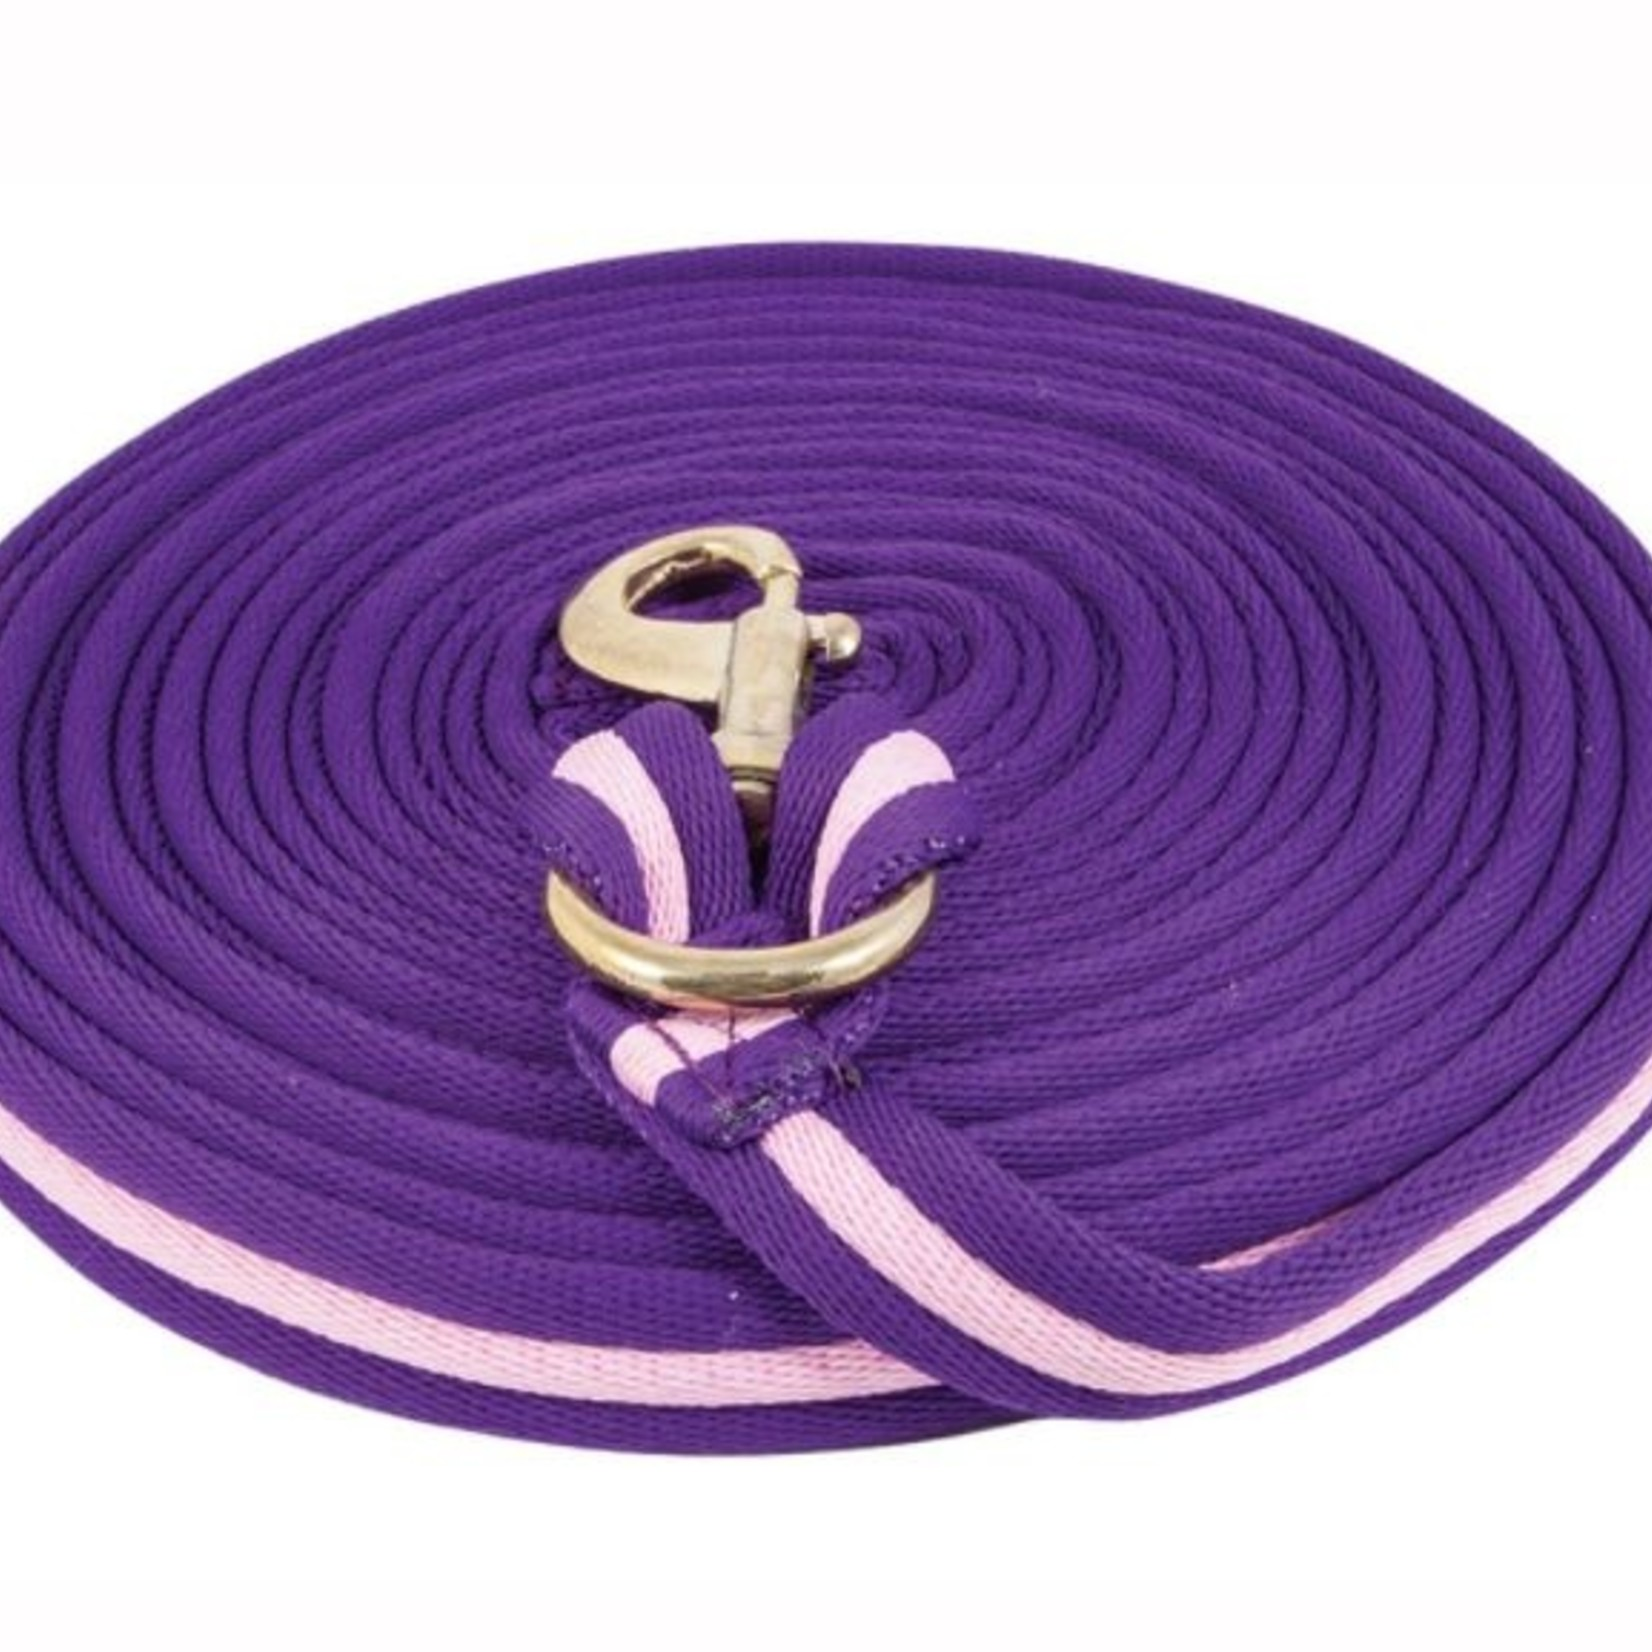 Cushion Lunge Line - Purple/Pink